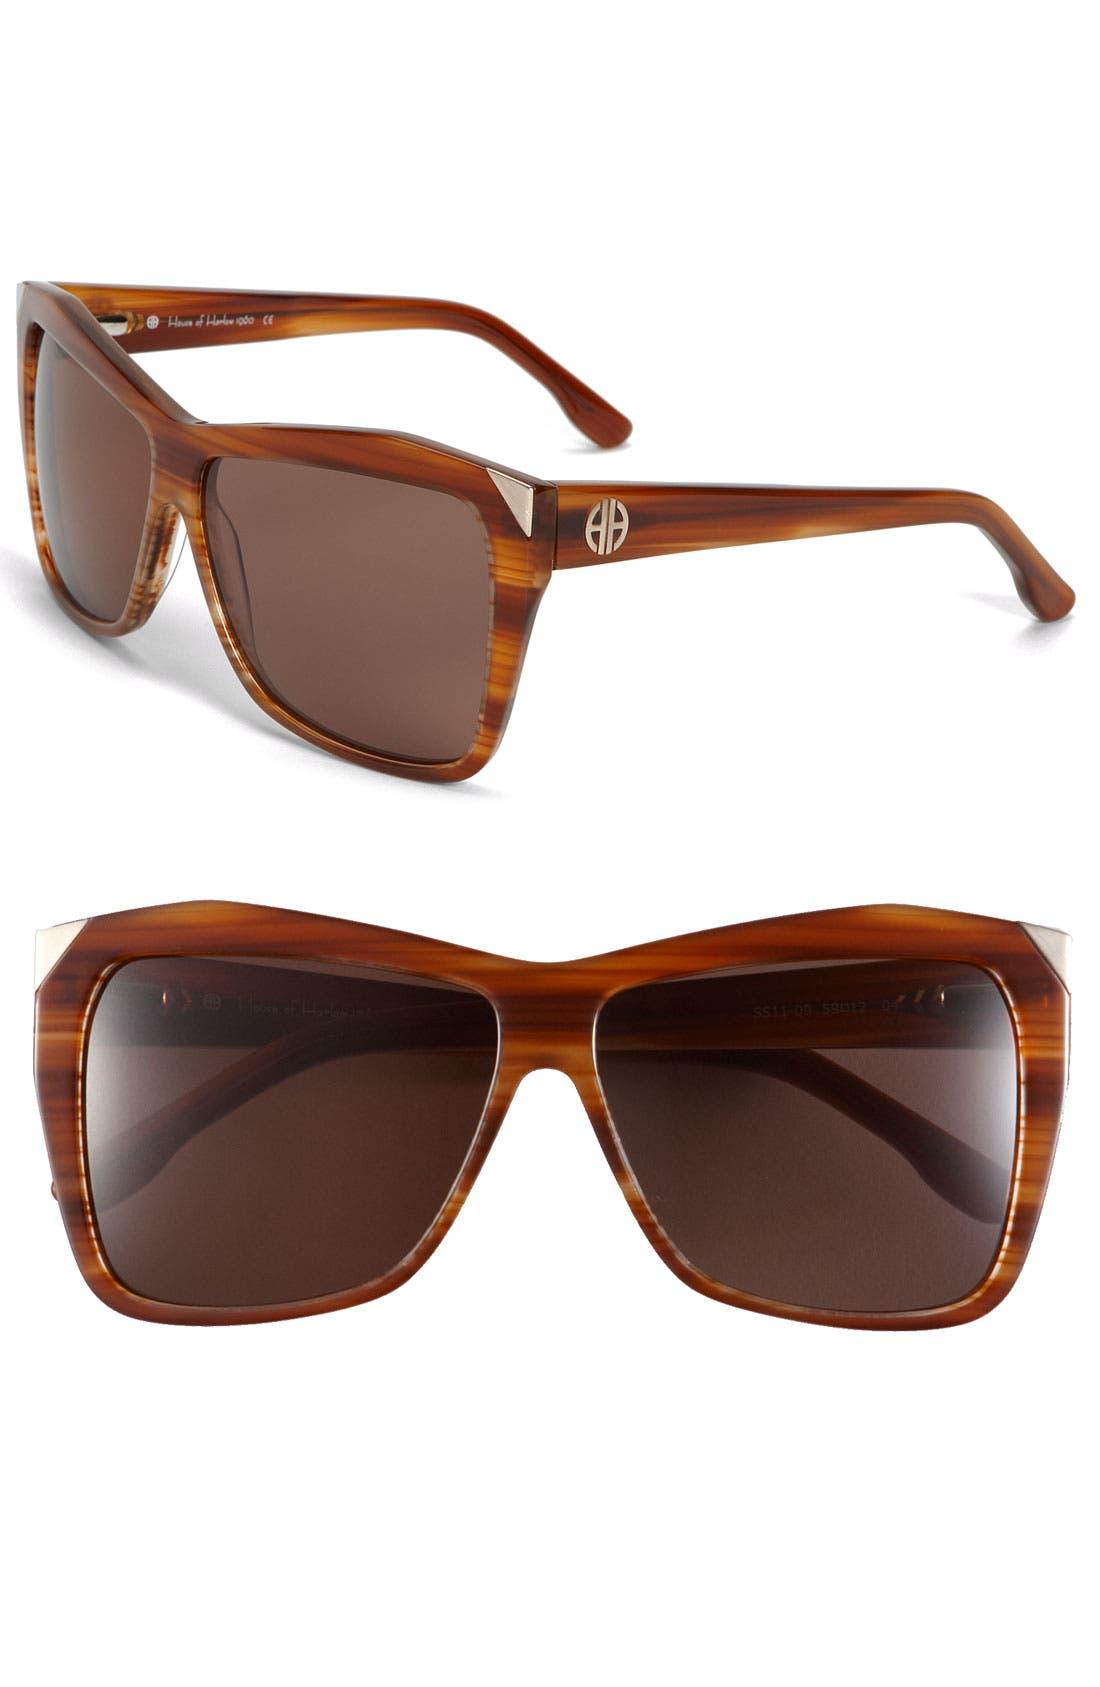 Main Image - House of Harlow 1960 'Marie' Sunglasses